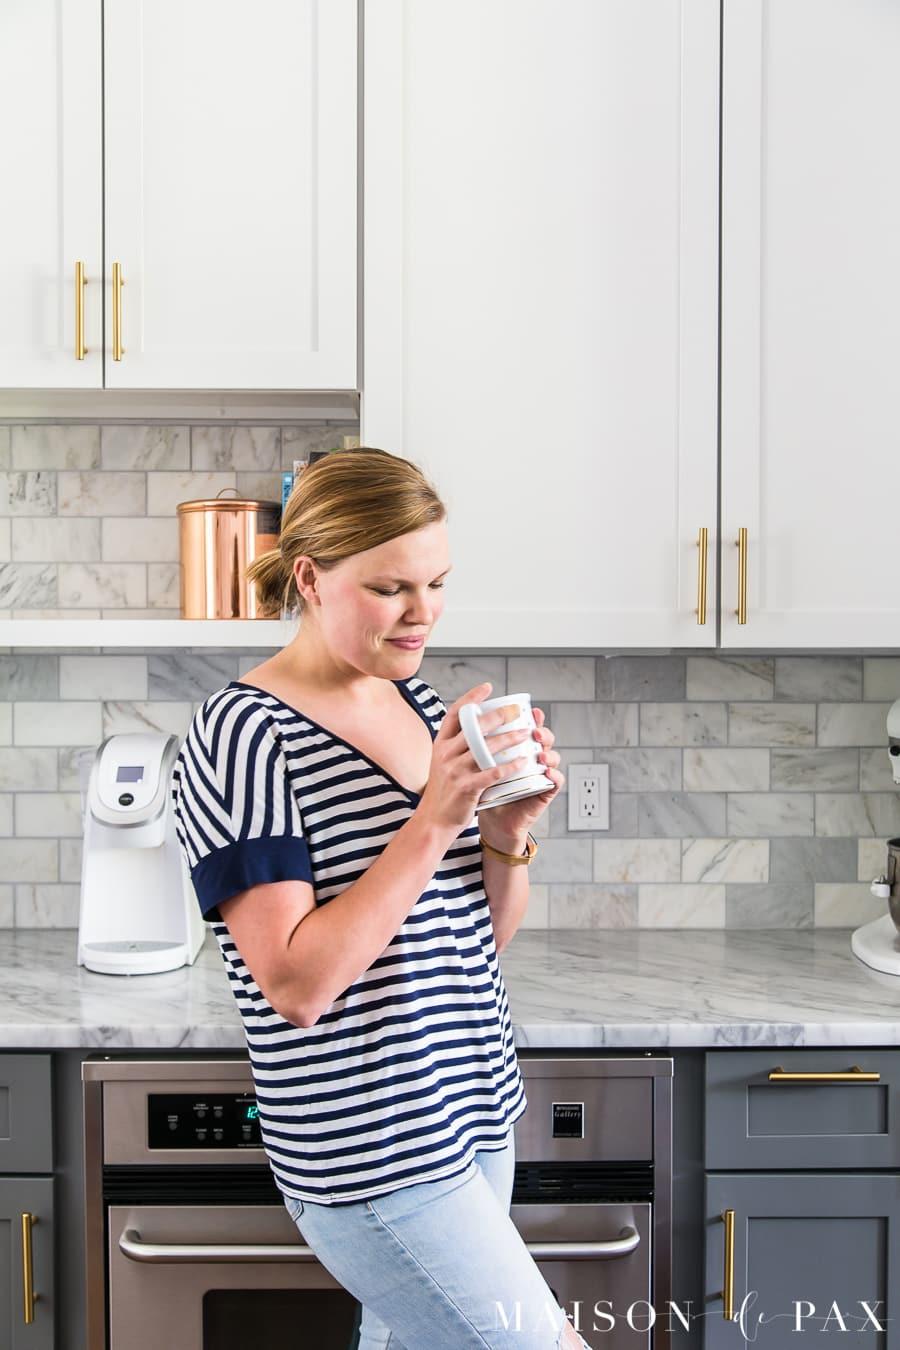 kitchen organizing ideas: create stations... get 5 more tips for kitchen organizing! #kitchenorganization #organizing #kitchendesign